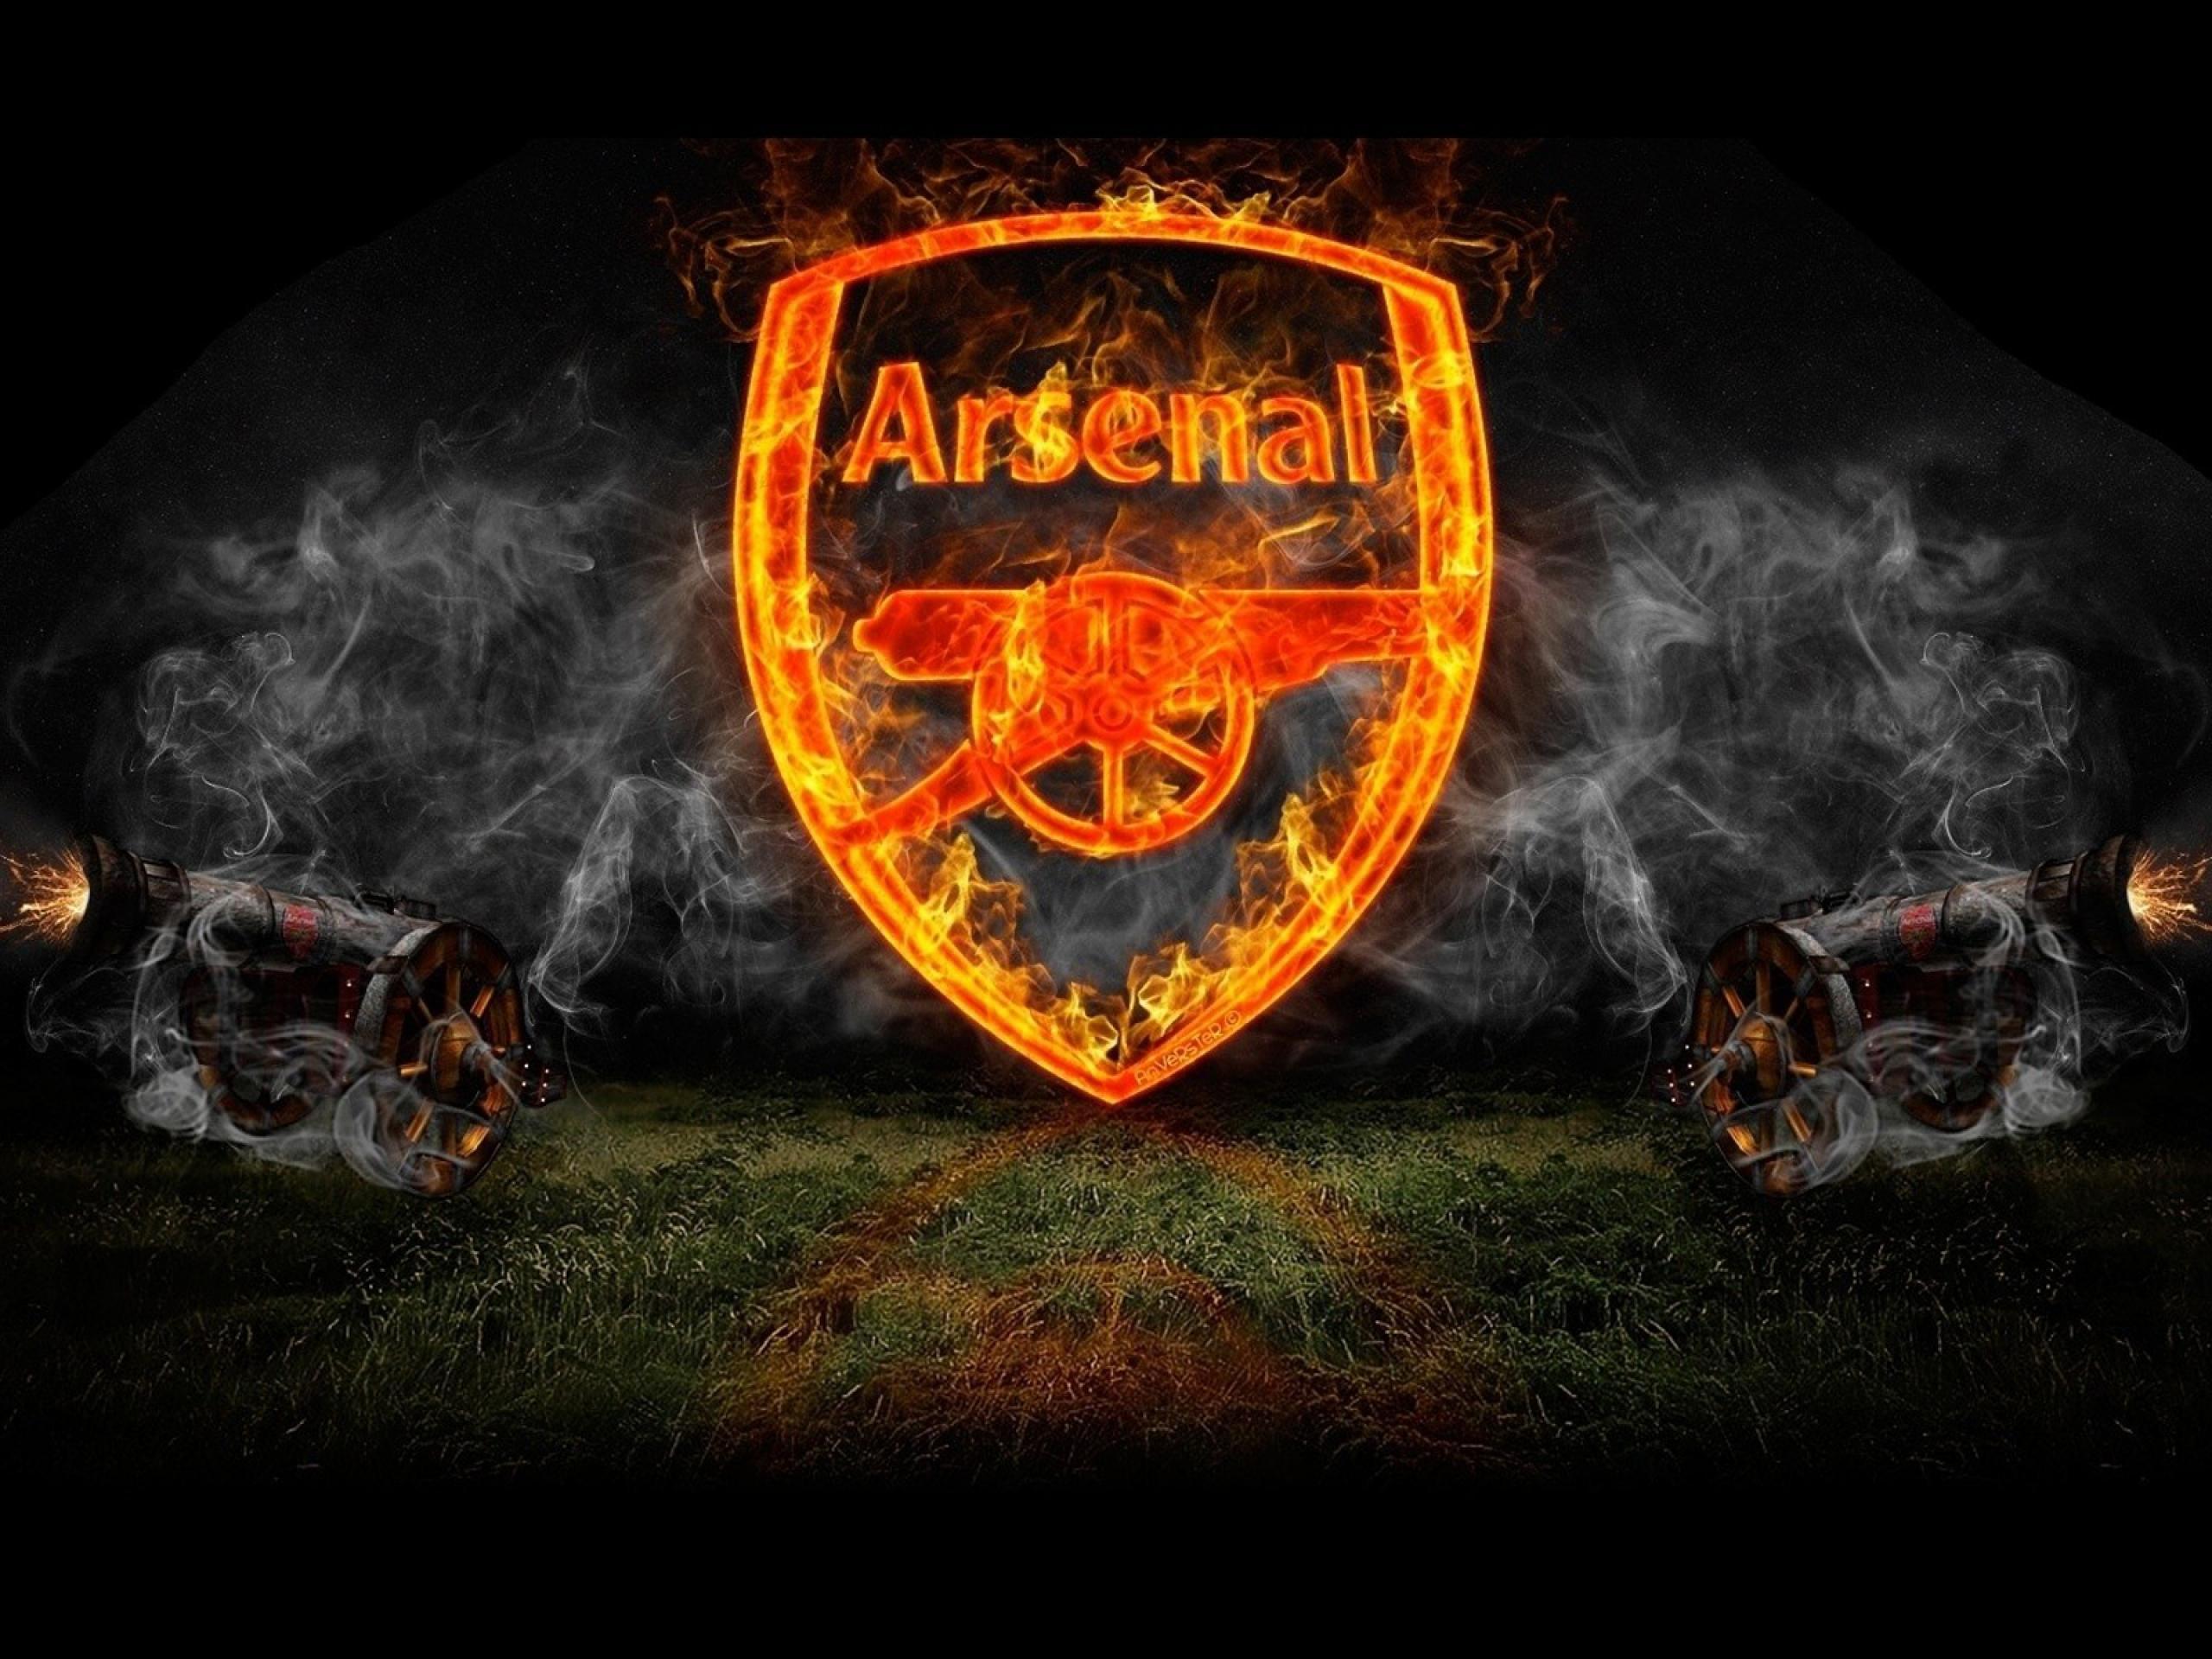 Arsenal Fc Wallpapers Hd Arsenal  FC 7jpg 2560x1920